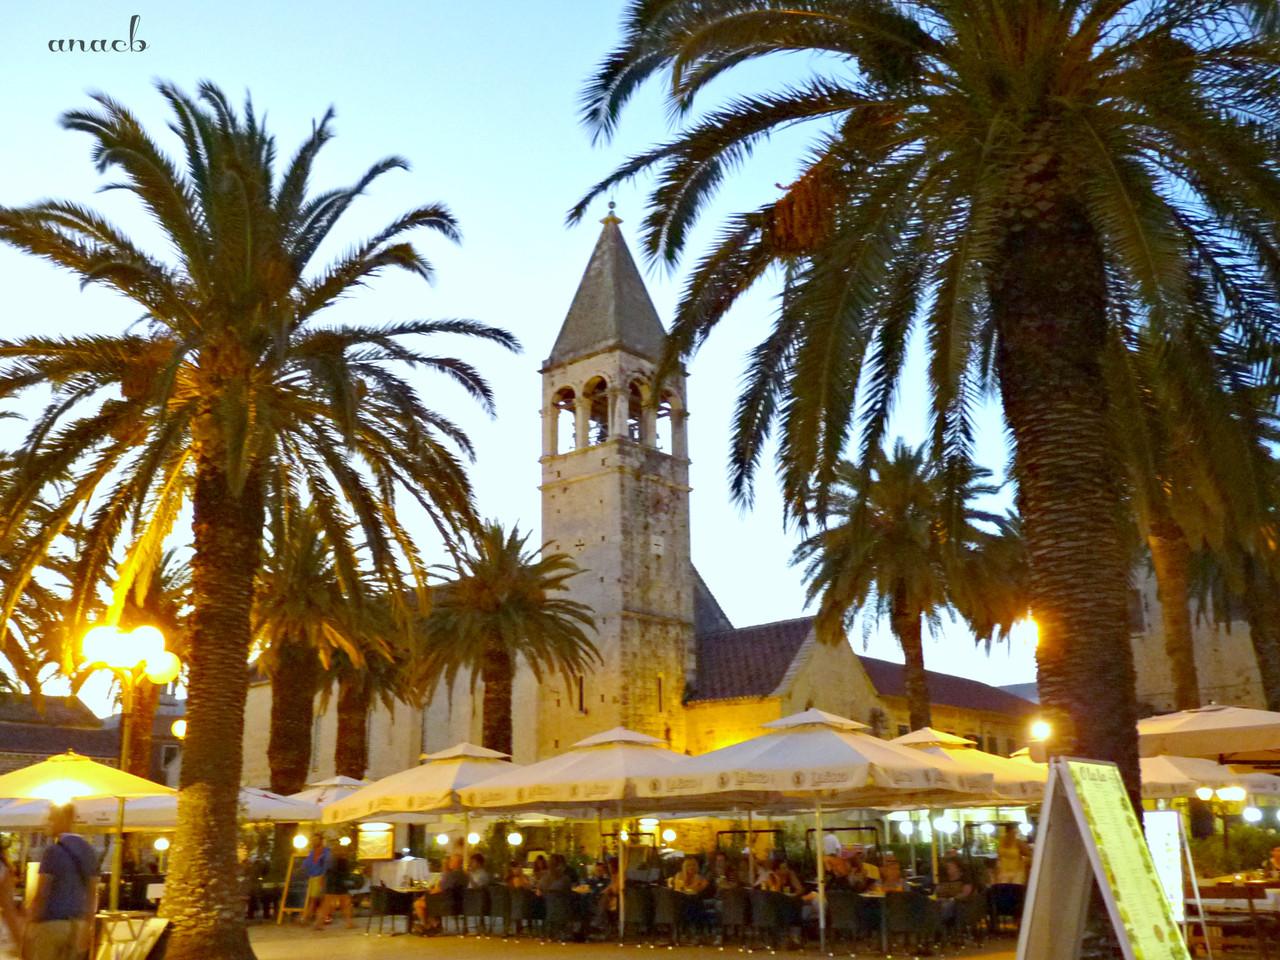 Trogir - St. dominic's Monastery and Riva - viajar